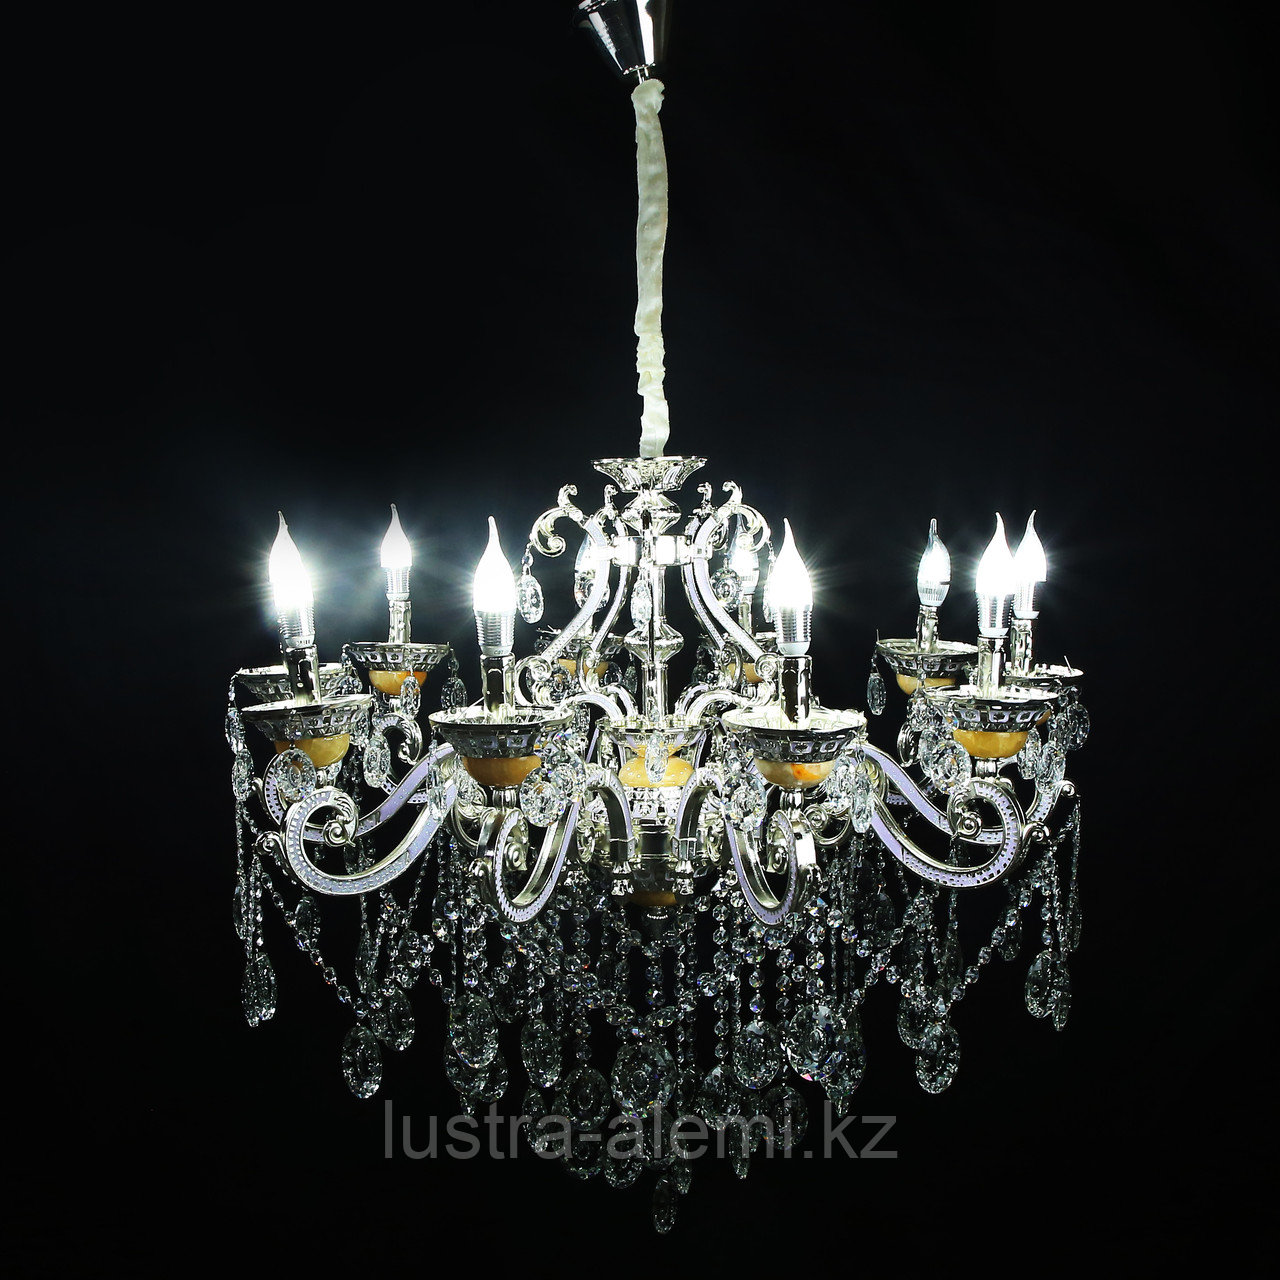 Люстра Классика 8825/10 Silver